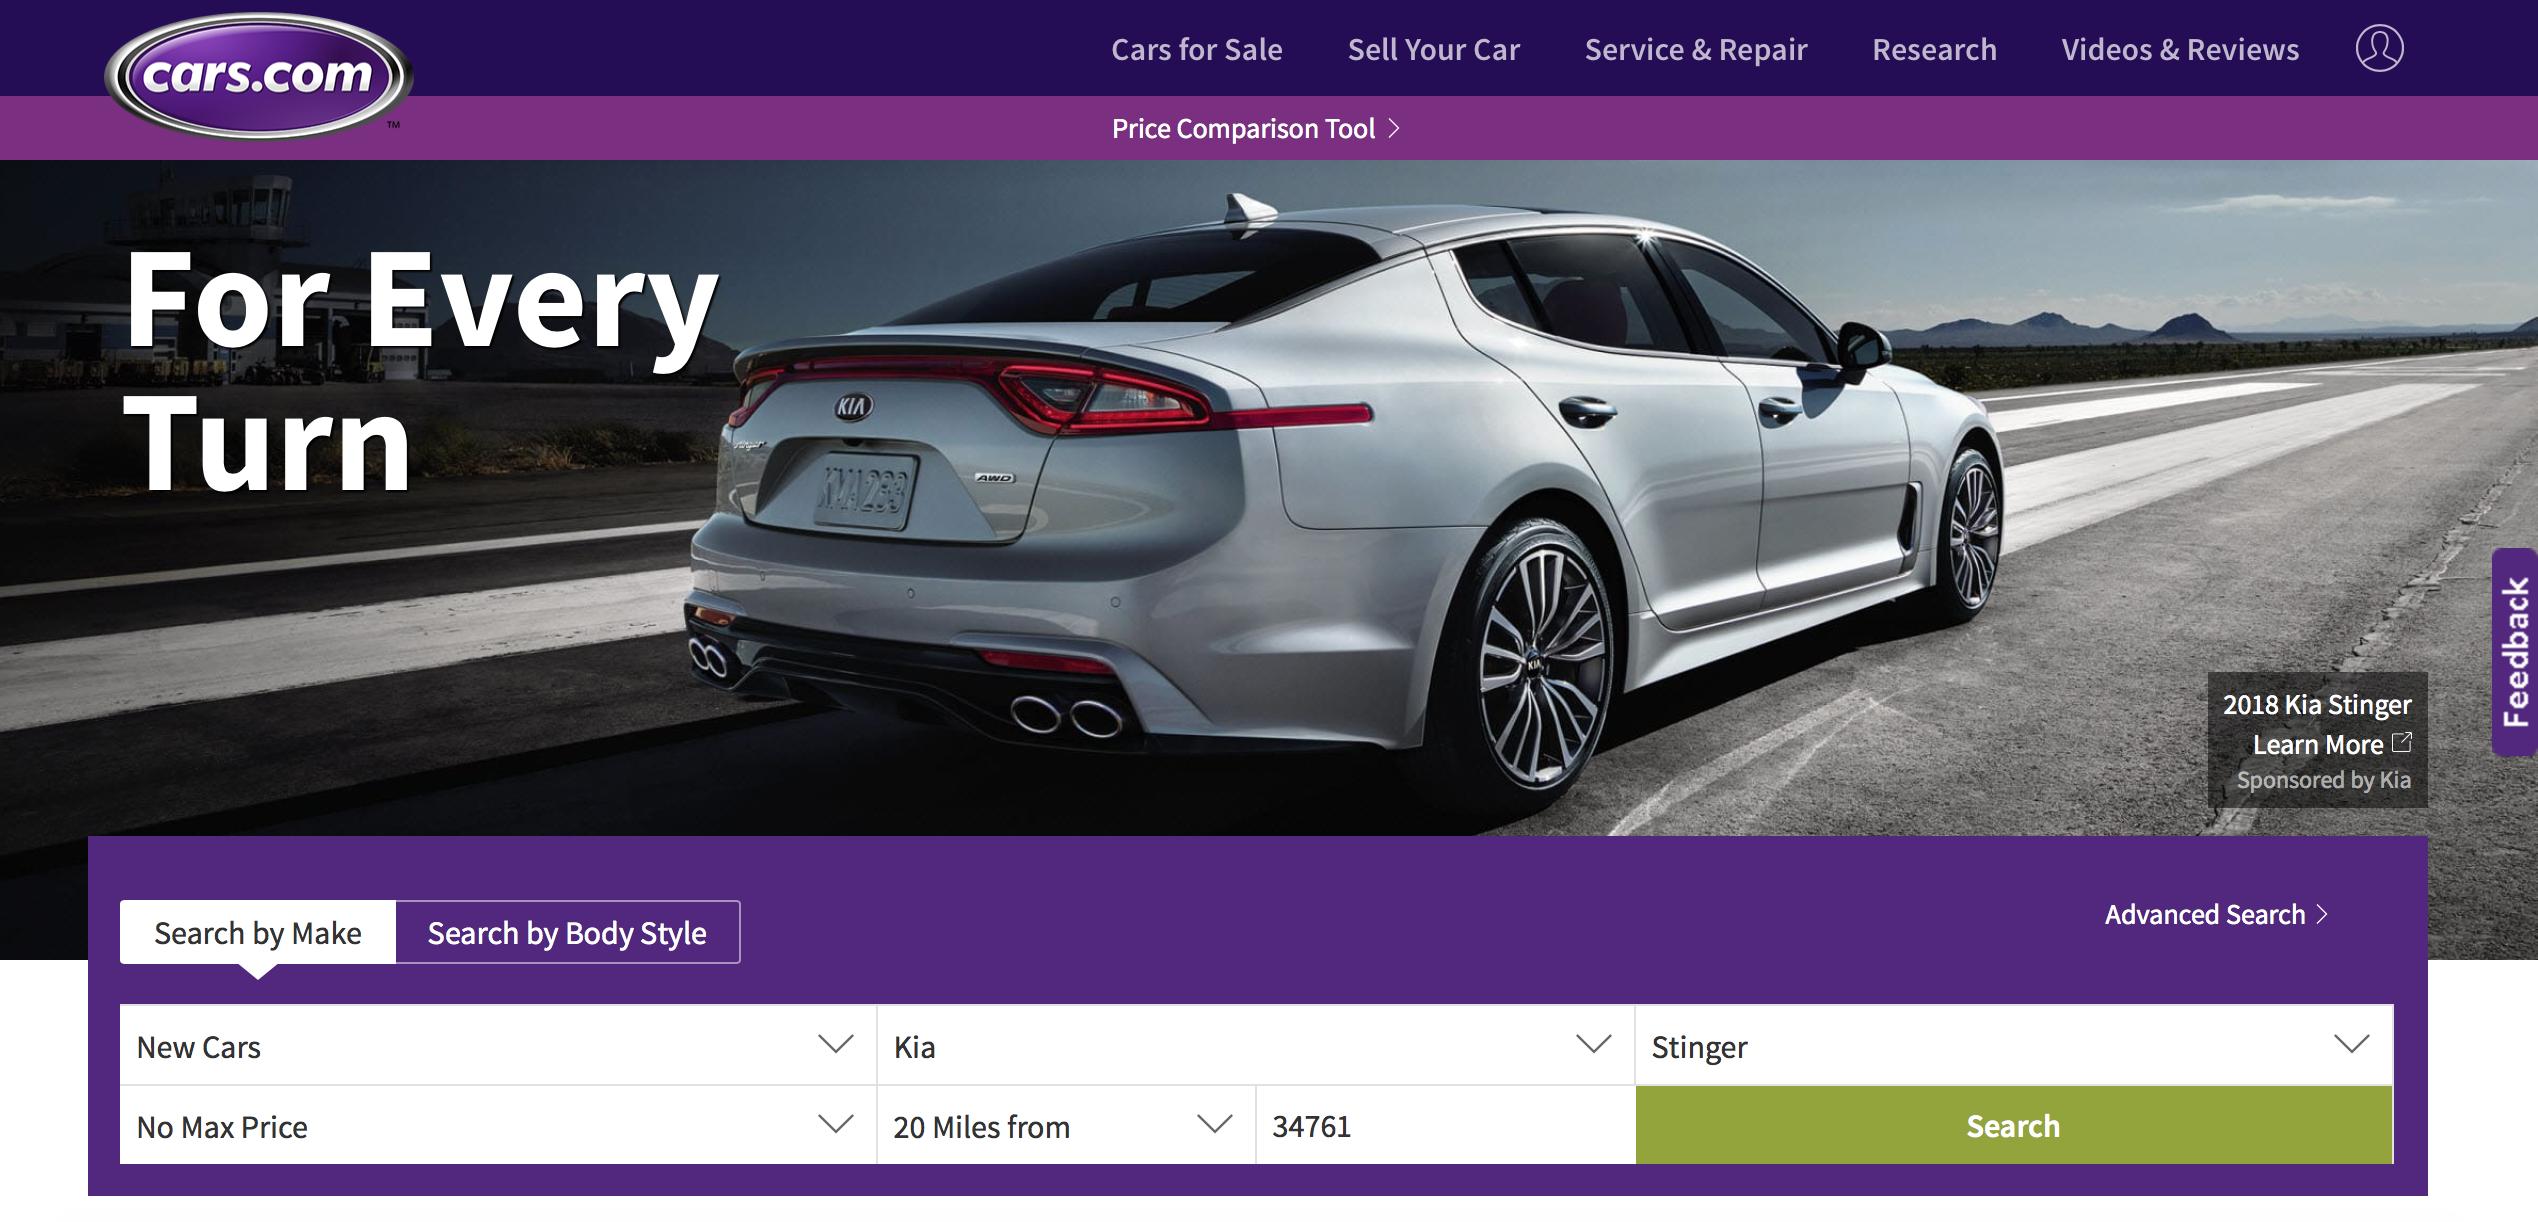 Cars.com Home Page